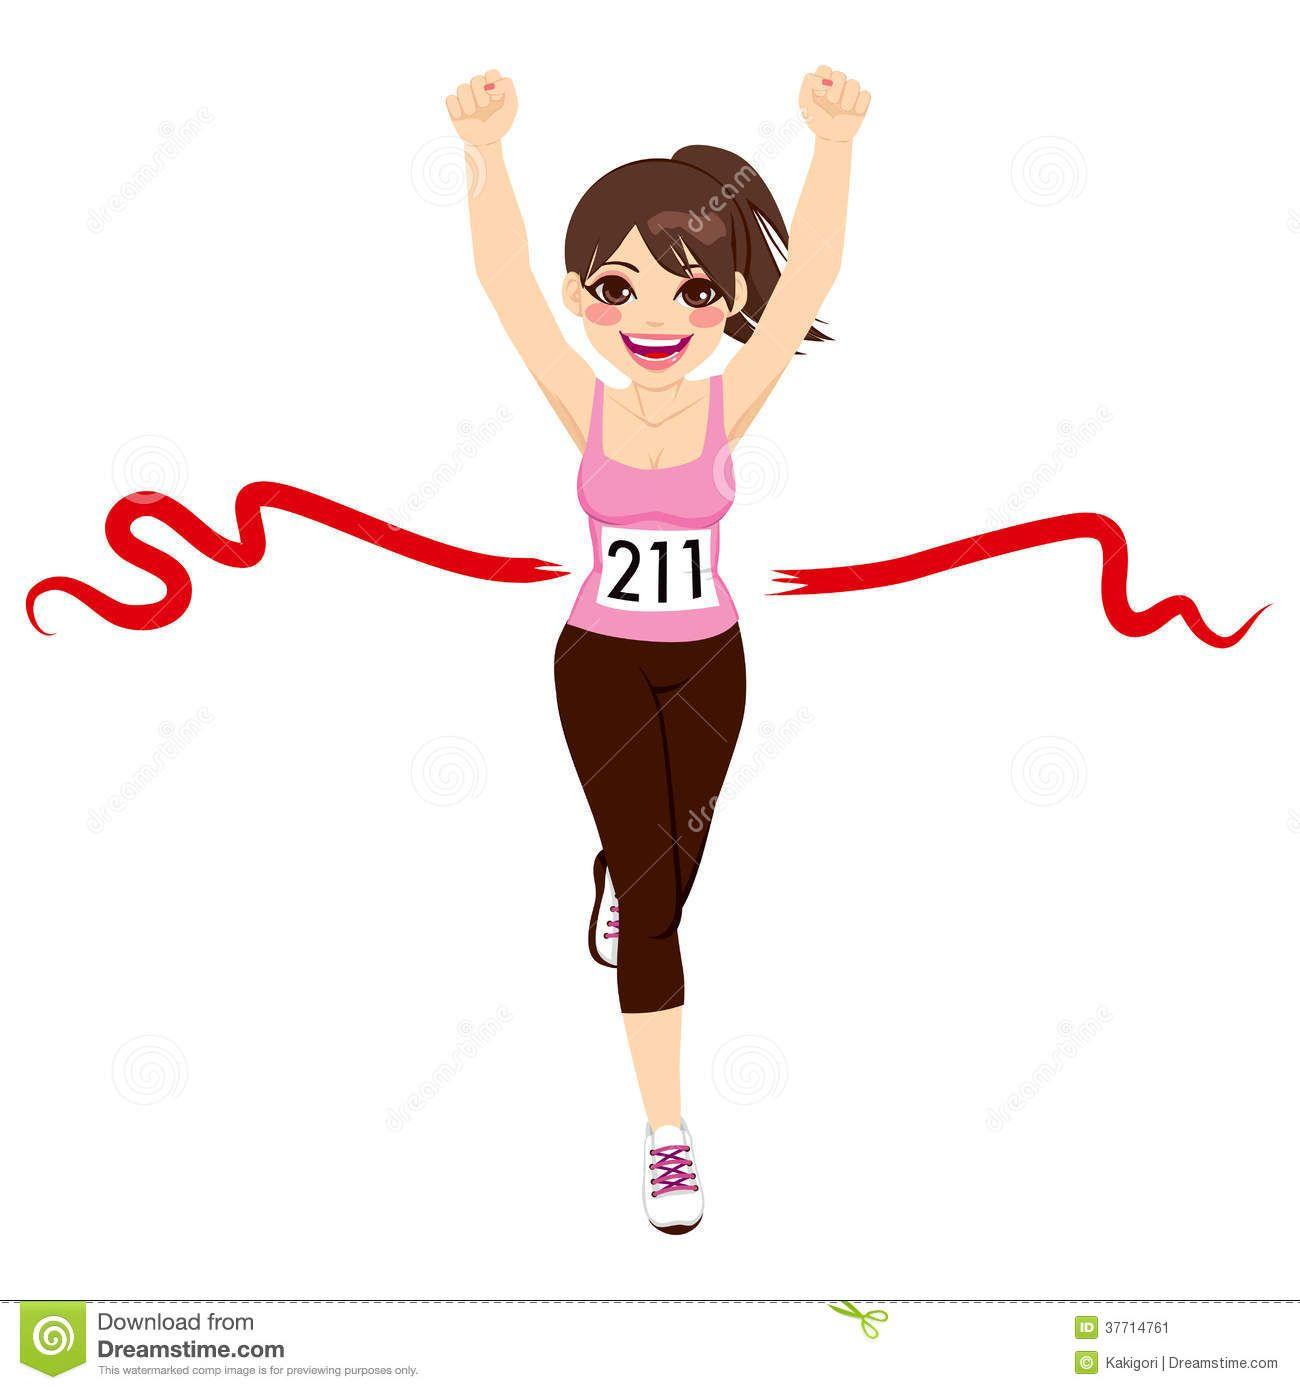 Clipart Race Marathon Finish Line Google Search Academia Fitness